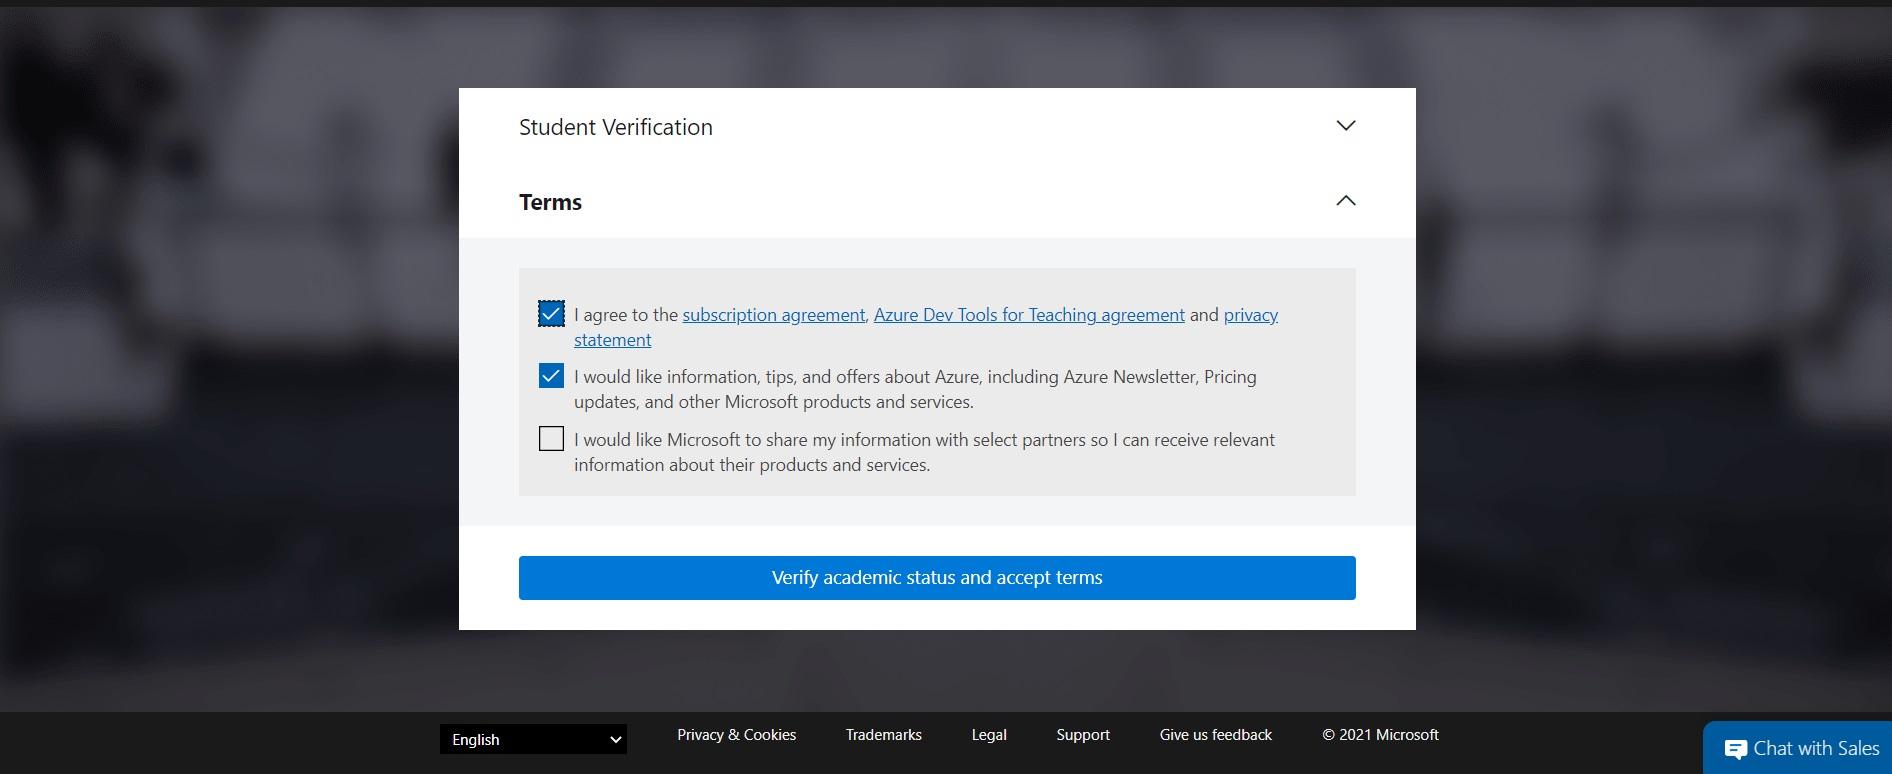 Azure Verify Academic Status